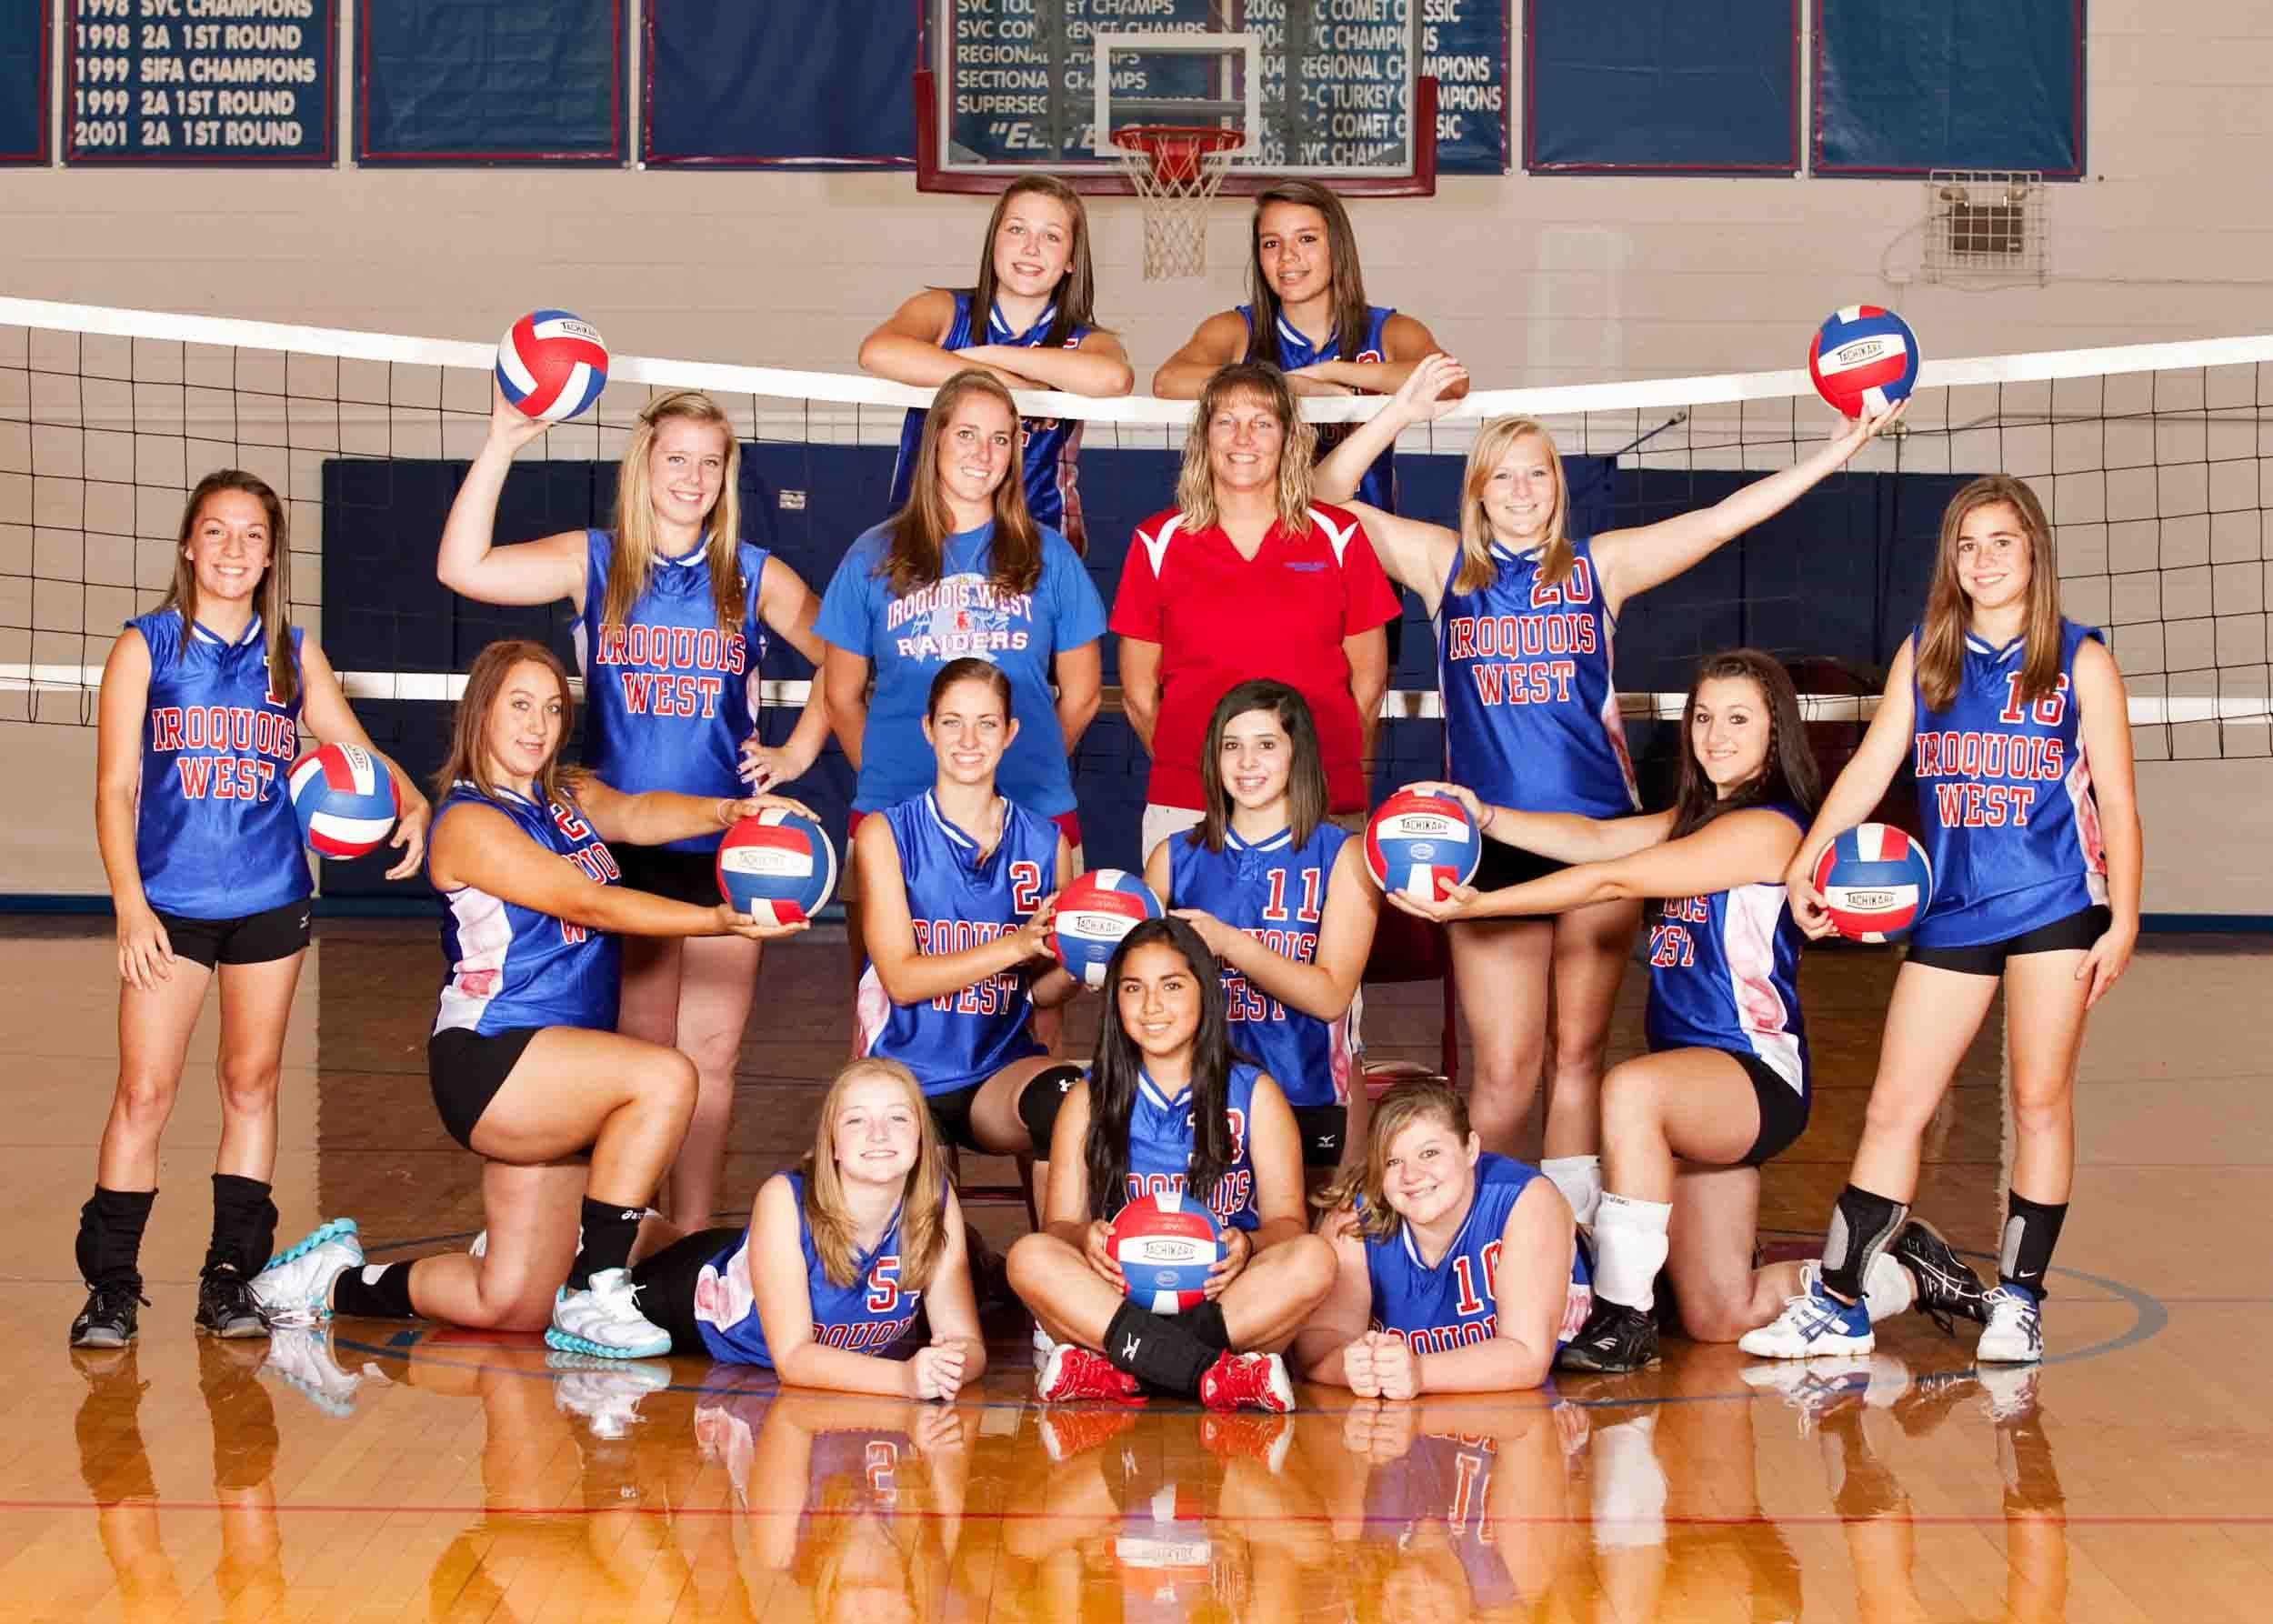 Volleyball Volleyball Volleyball Team Pictures Volleyball Team Team Pictures